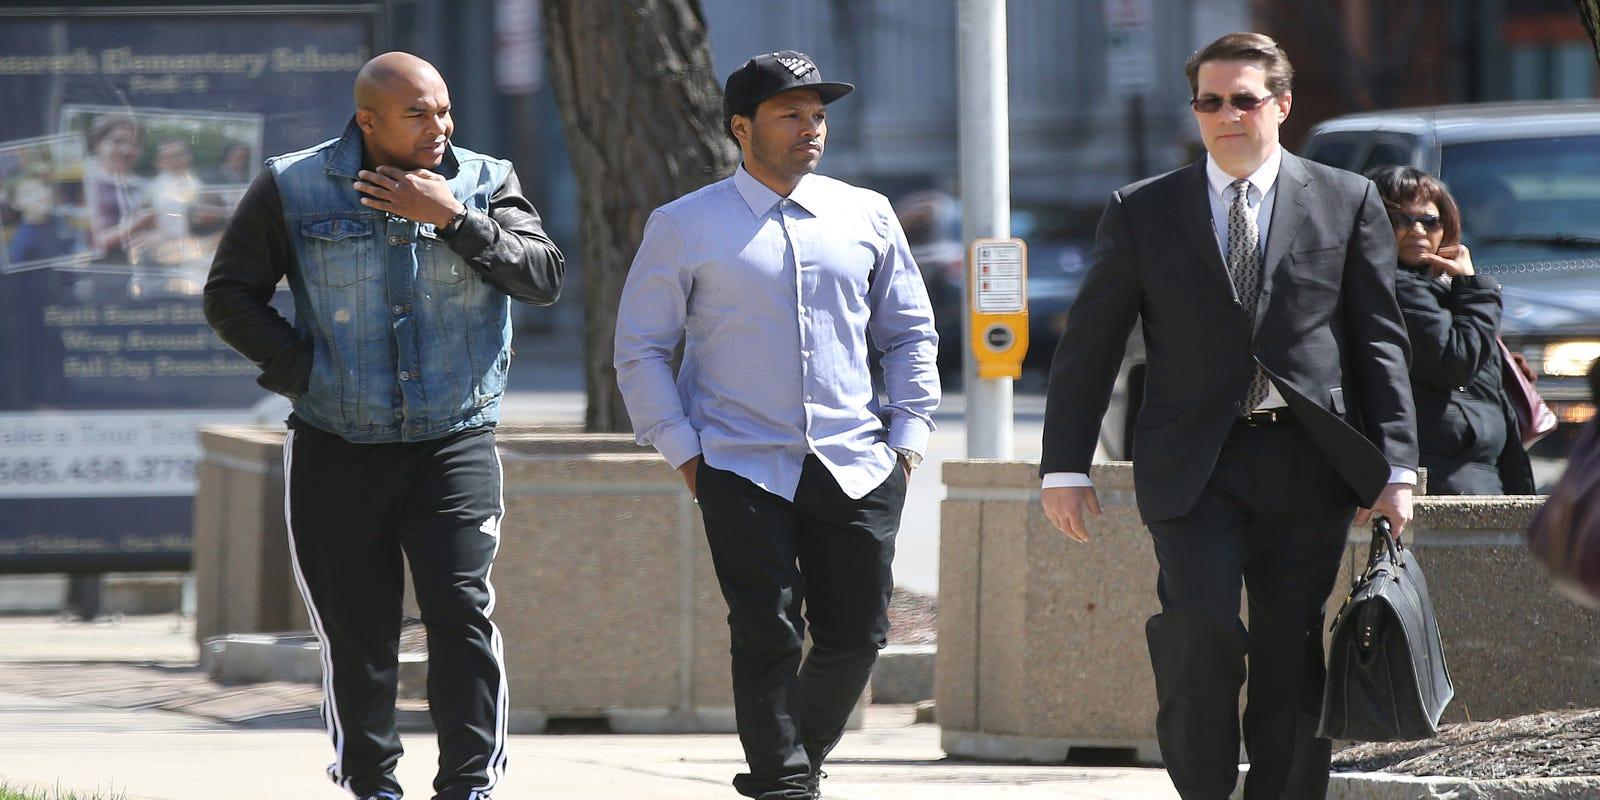 Mendeecees Harris: Love & Hip Hop star's jail time not reduced